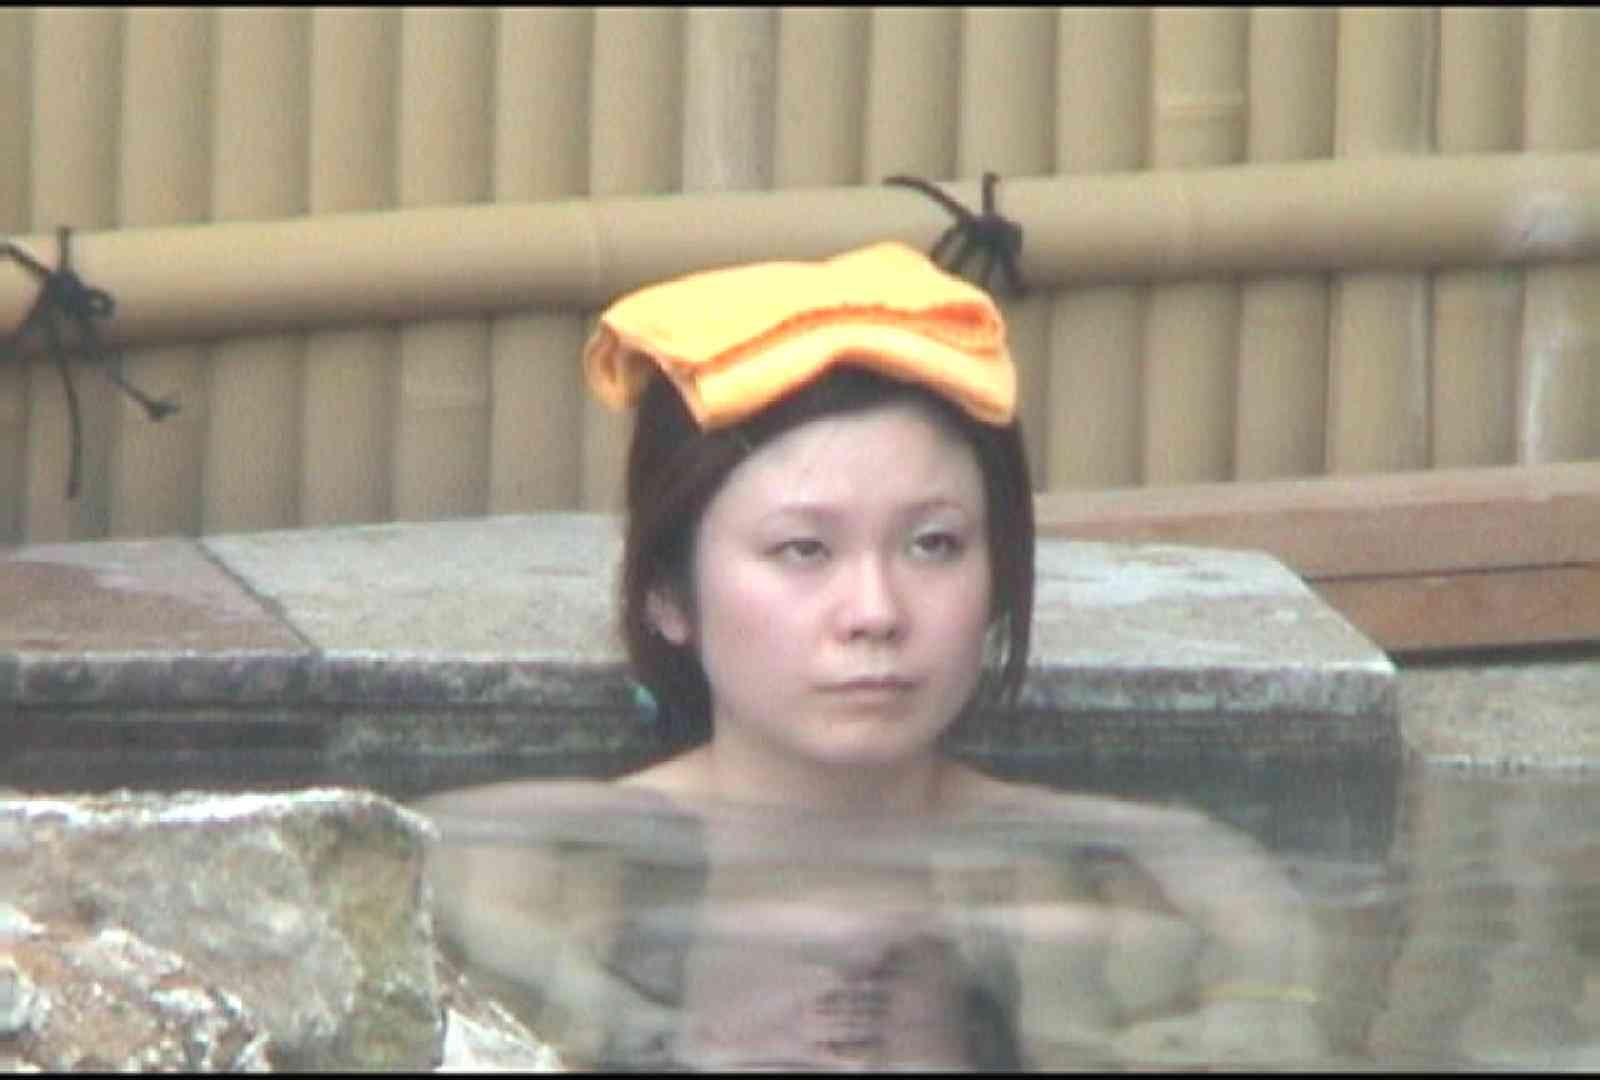 Aquaな露天風呂Vol.177 綺麗なOLたち アダルト動画キャプチャ 112枚 89